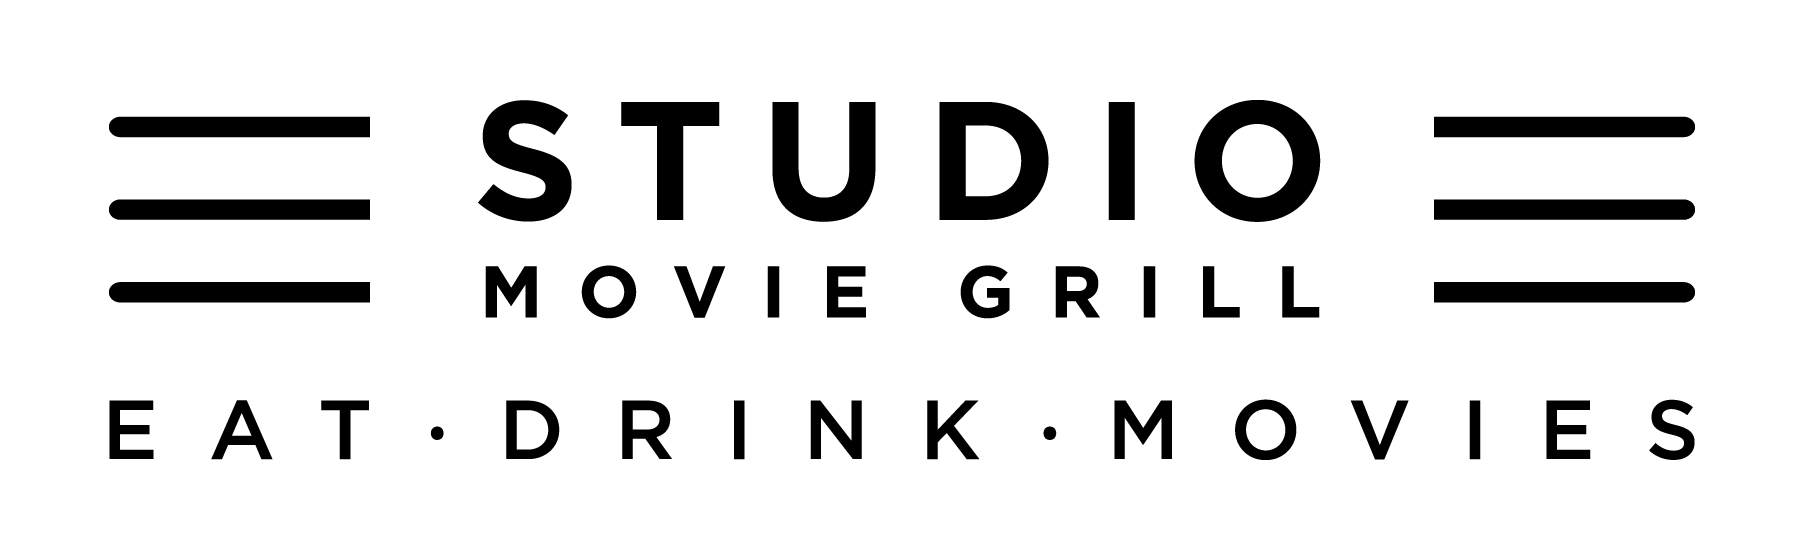 Image result for studio movie grill logo rocklin